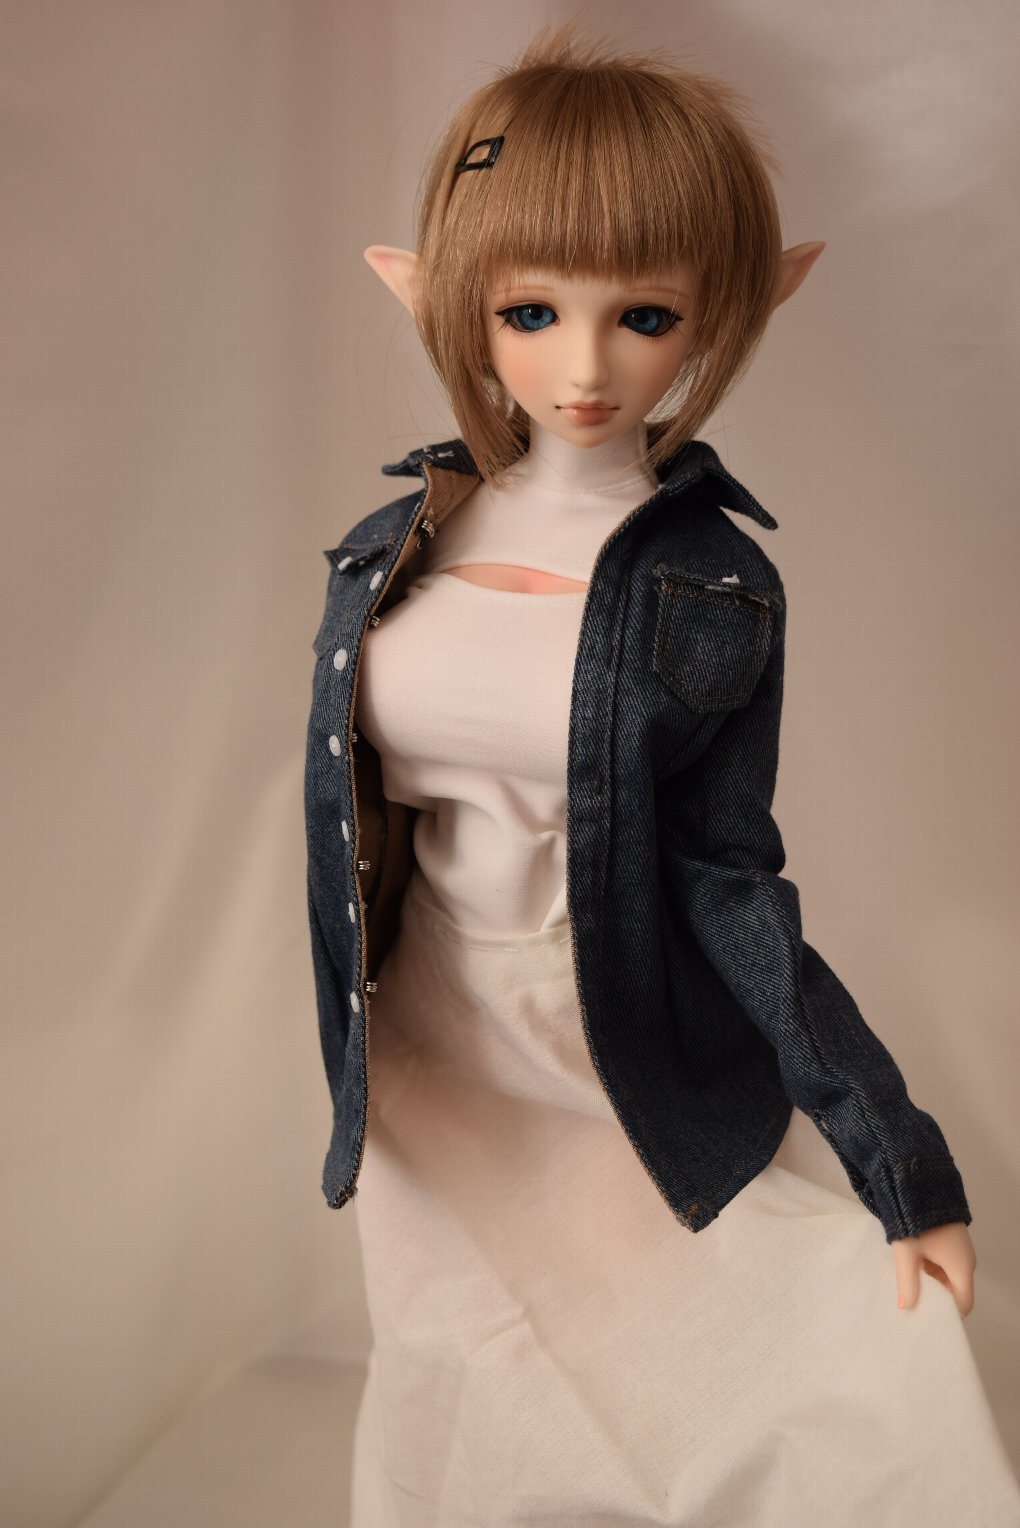 doll_3247.jpg